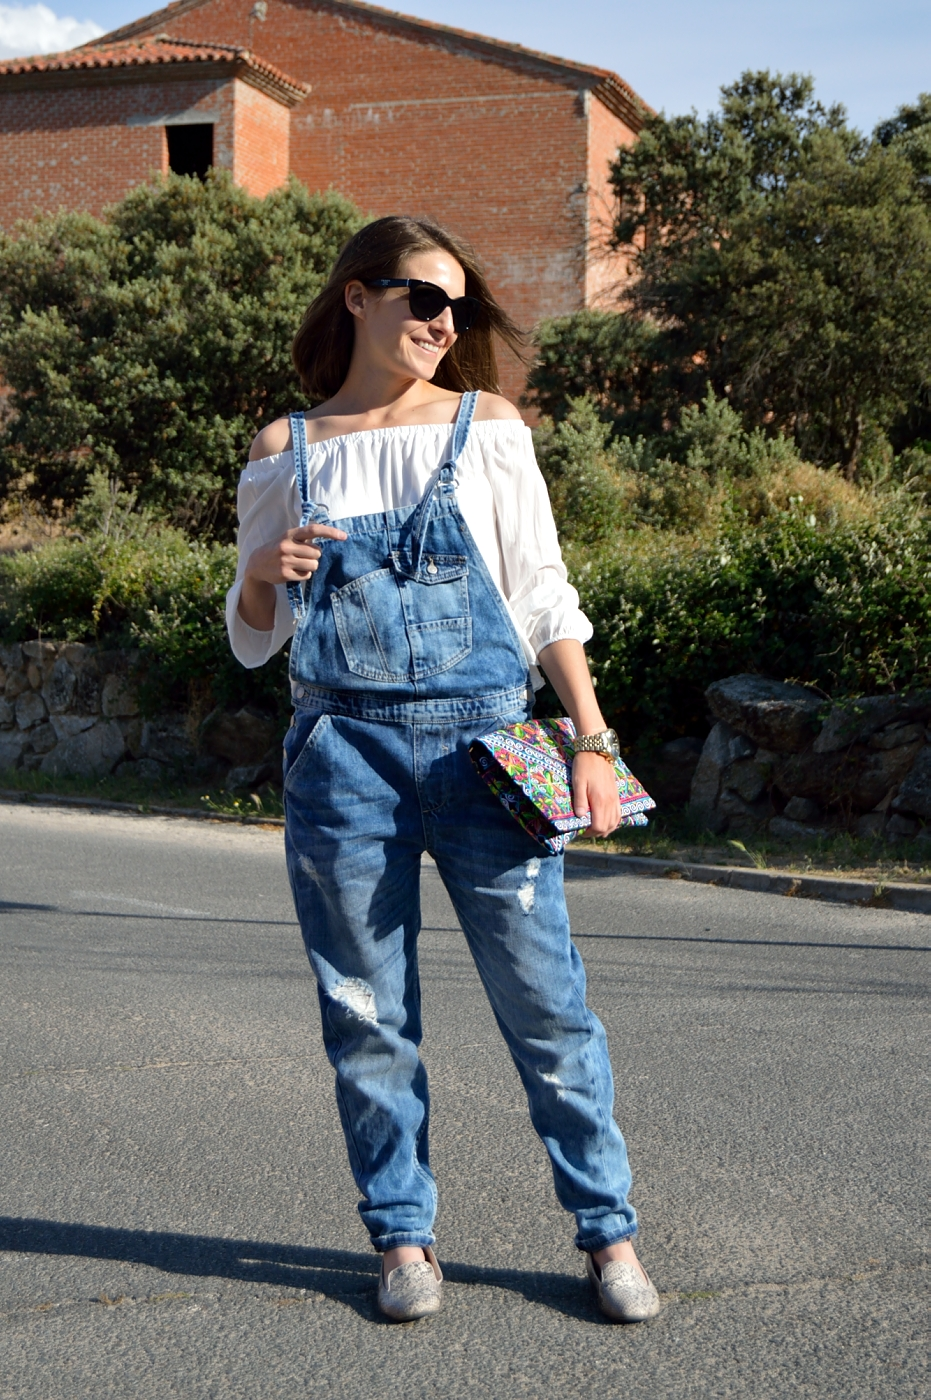 lara-vazquez-mad-lula-fashion-blog-moda-style-look-denim-jumpsuit